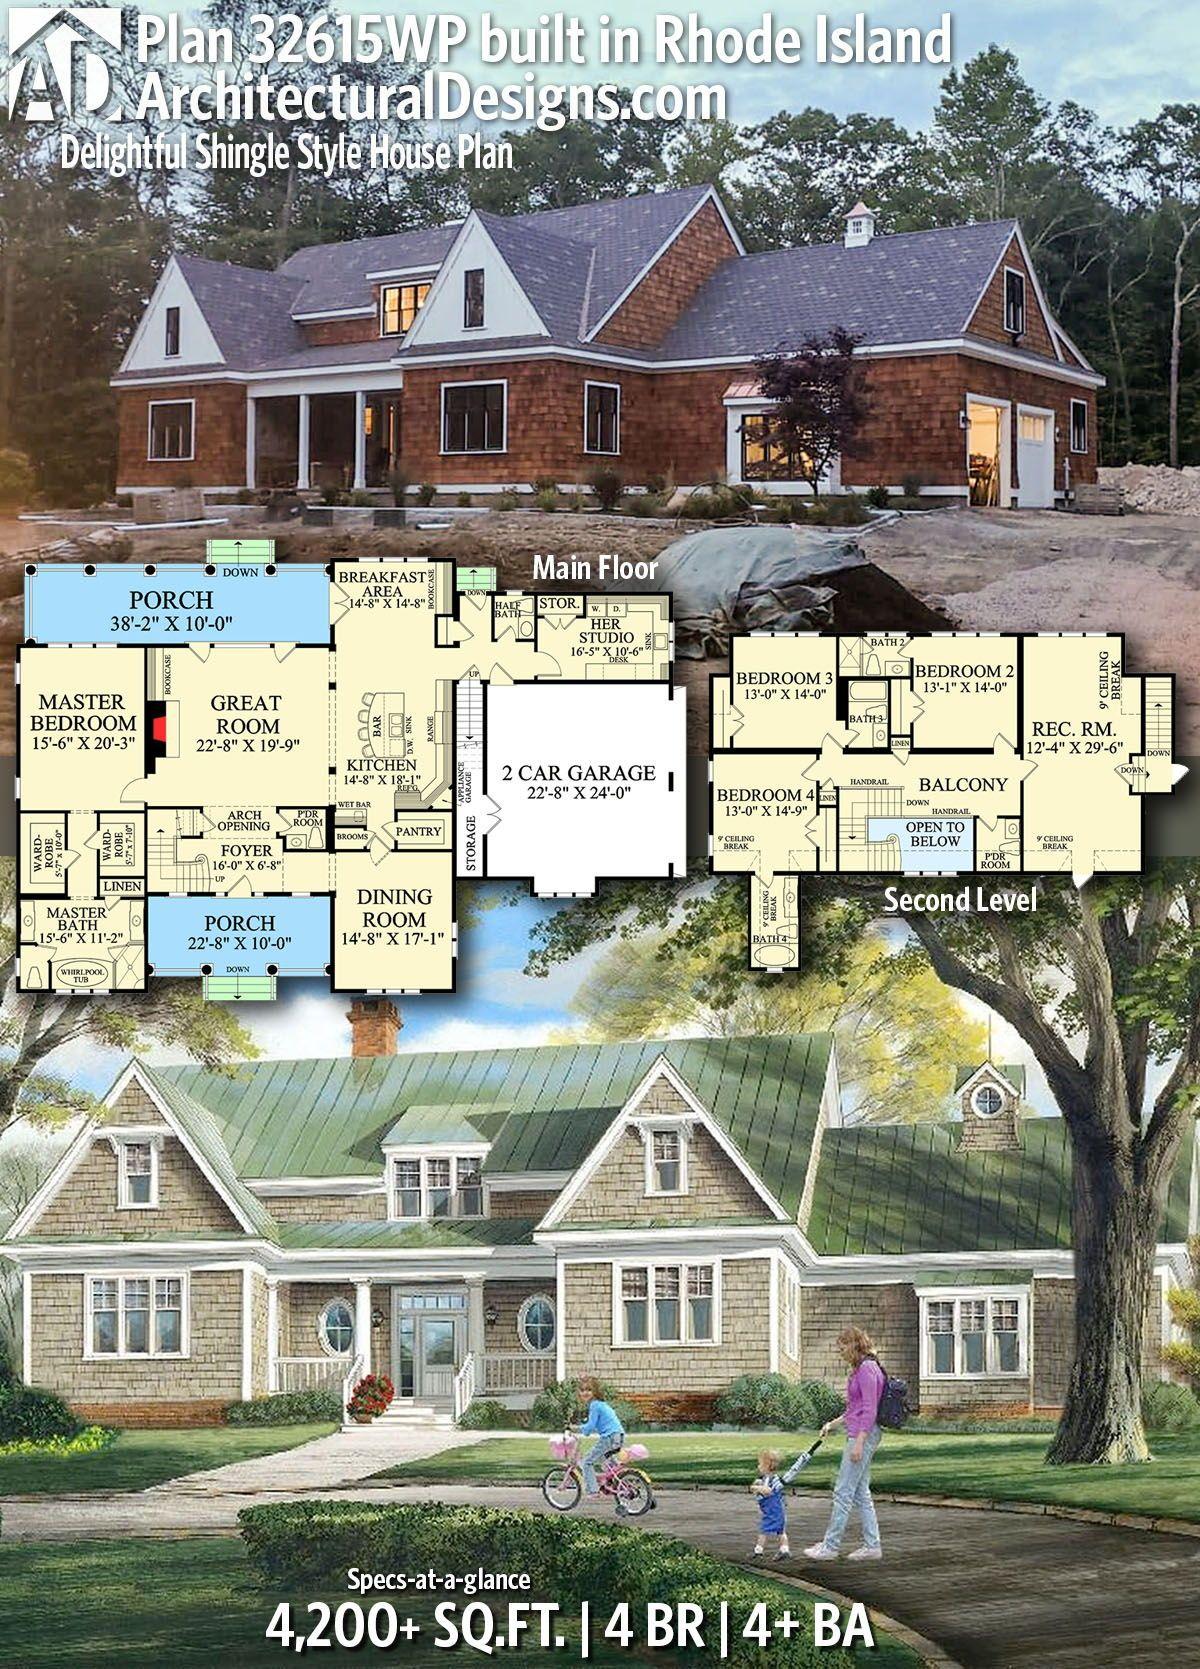 Plan 32615wp Delightful Shingle Style House Plan House Blueprints House Plans Architectural Design House Plans